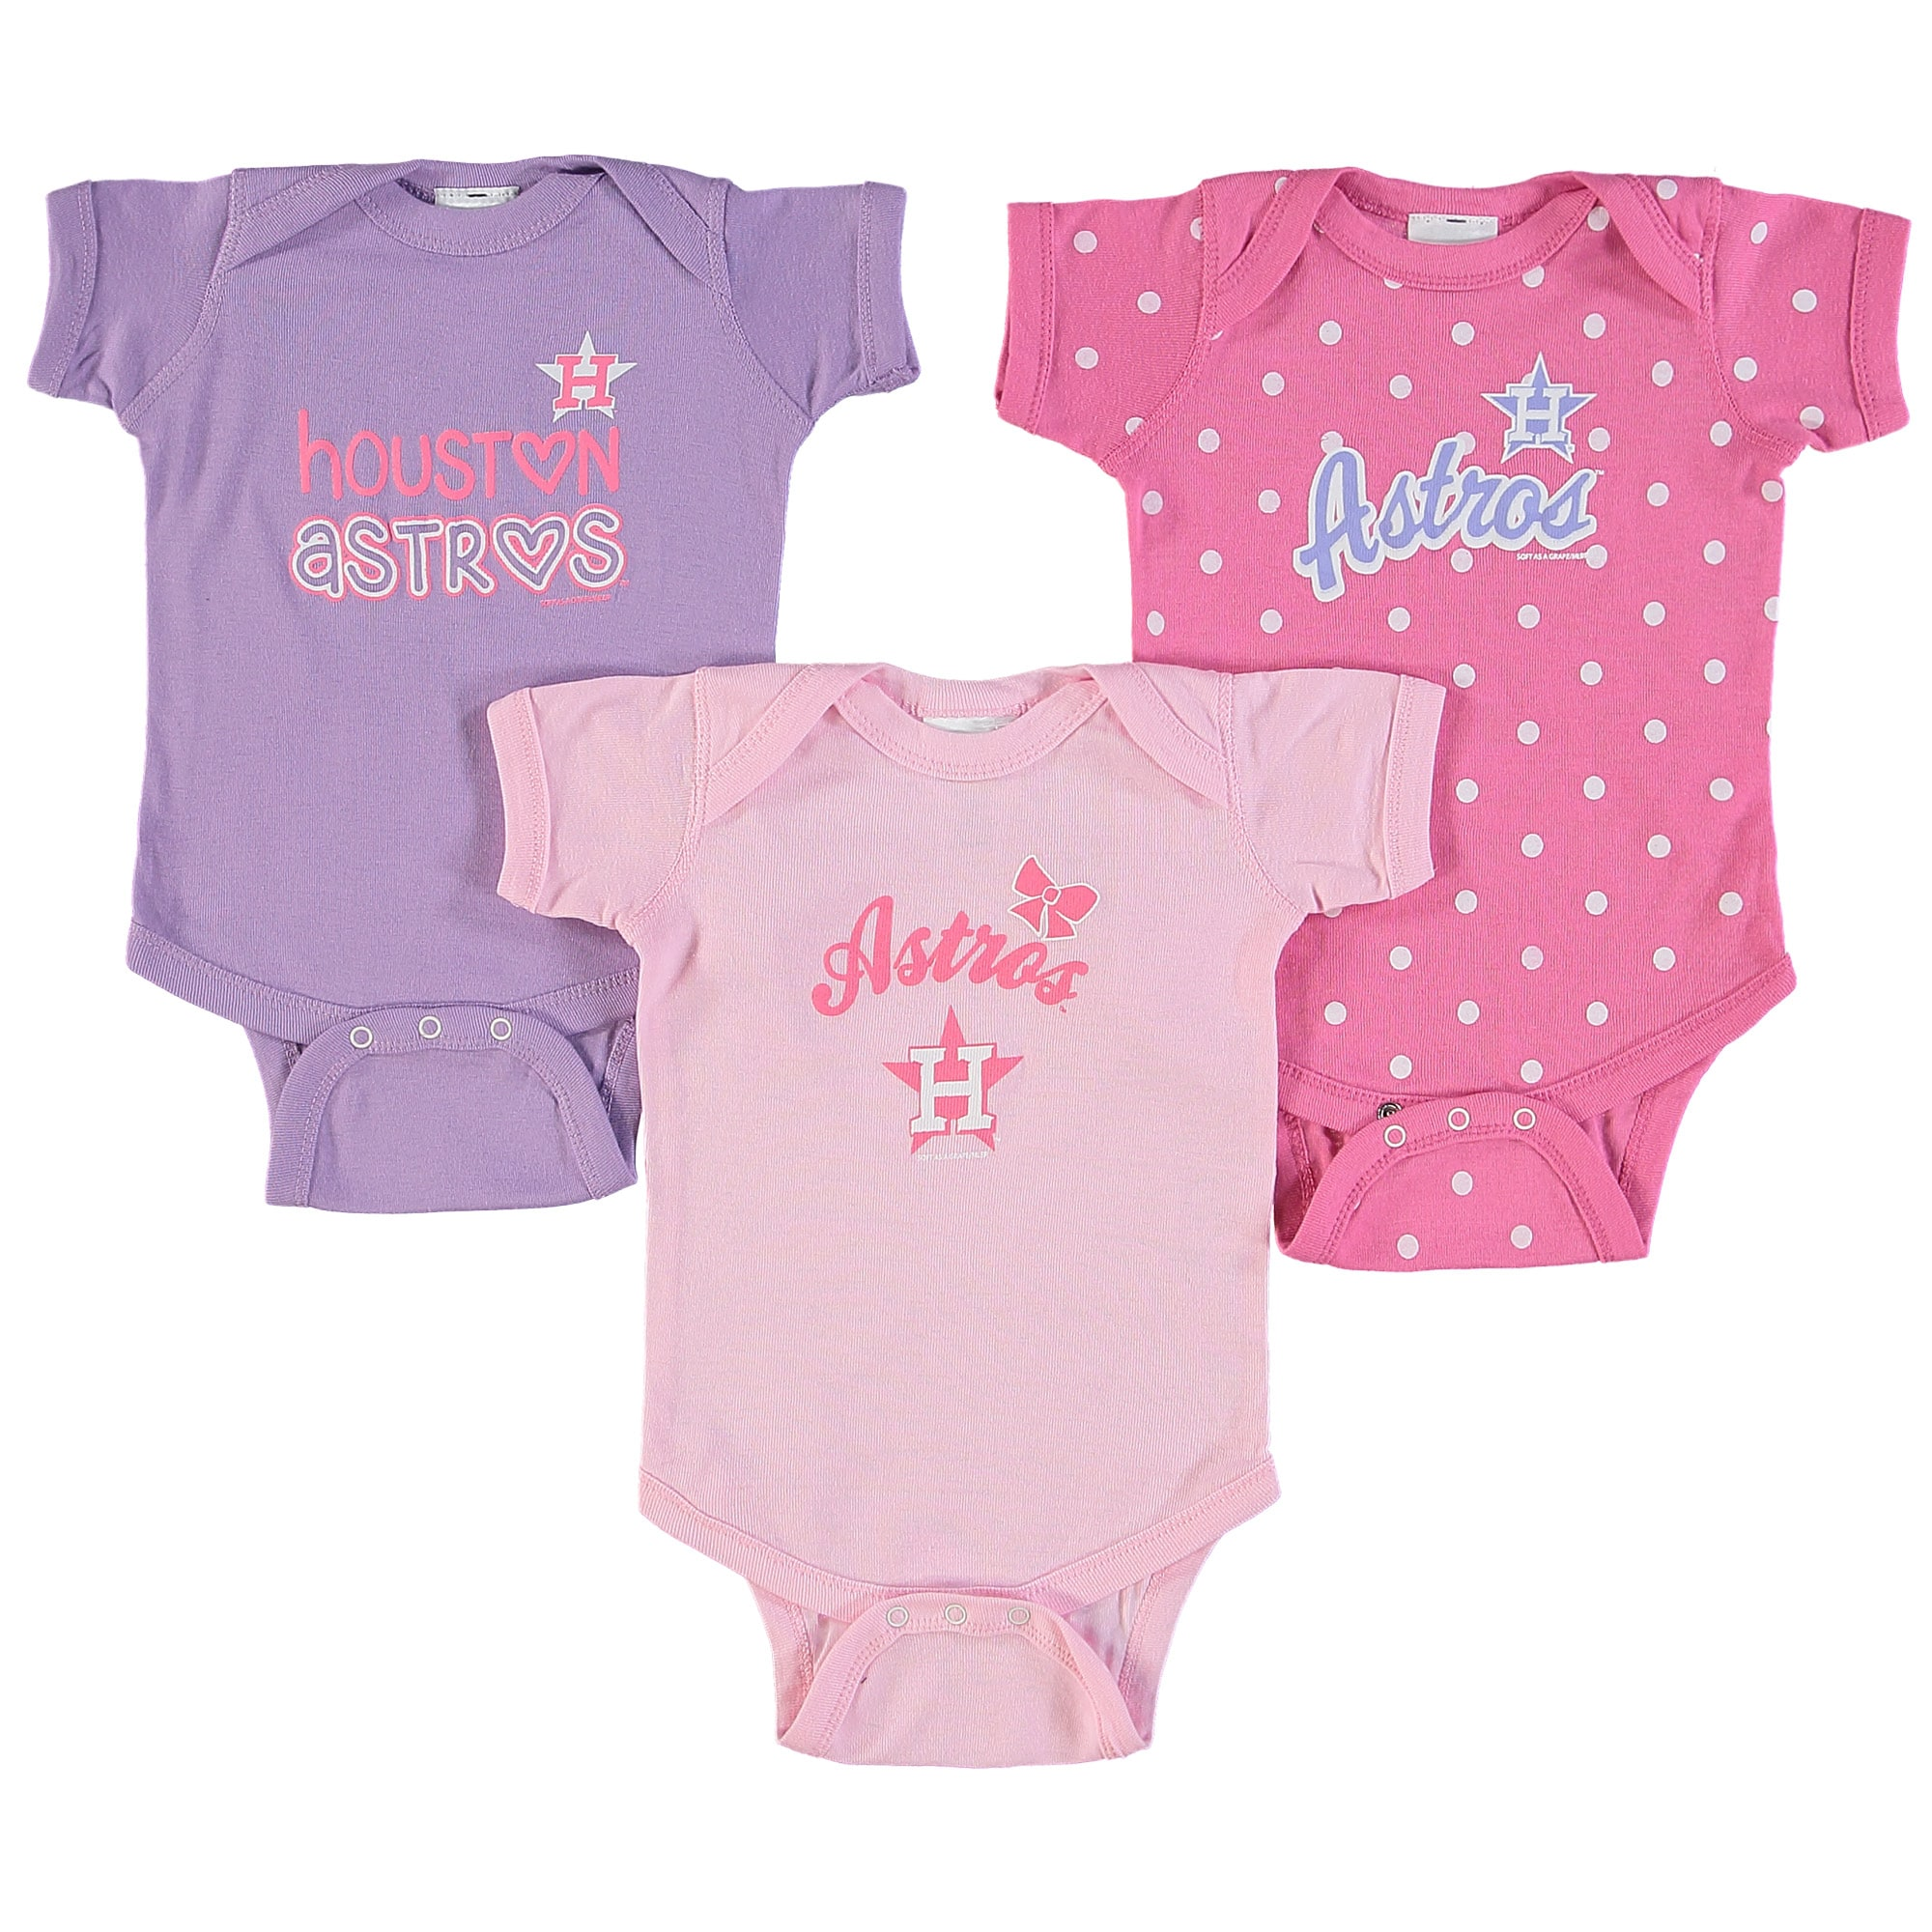 Houston Astros Soft as a Grape Girls Infant 3-Pack Rookie Bodysuit Set - Pink/Purple